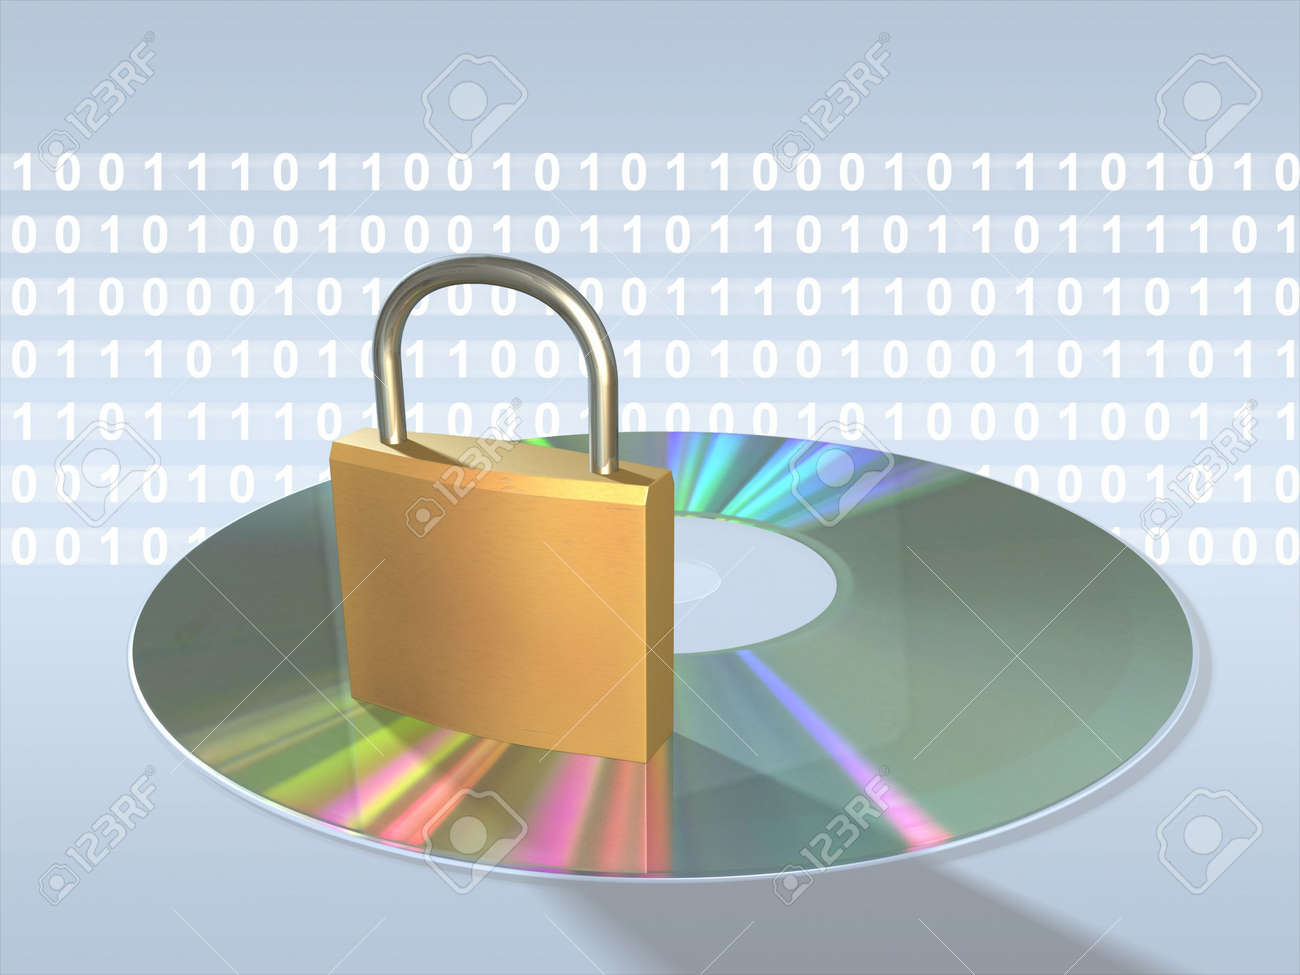 Protecting sensitive data. Keylock, cd and data stream. Digital illustration. Stock Illustration - 830494